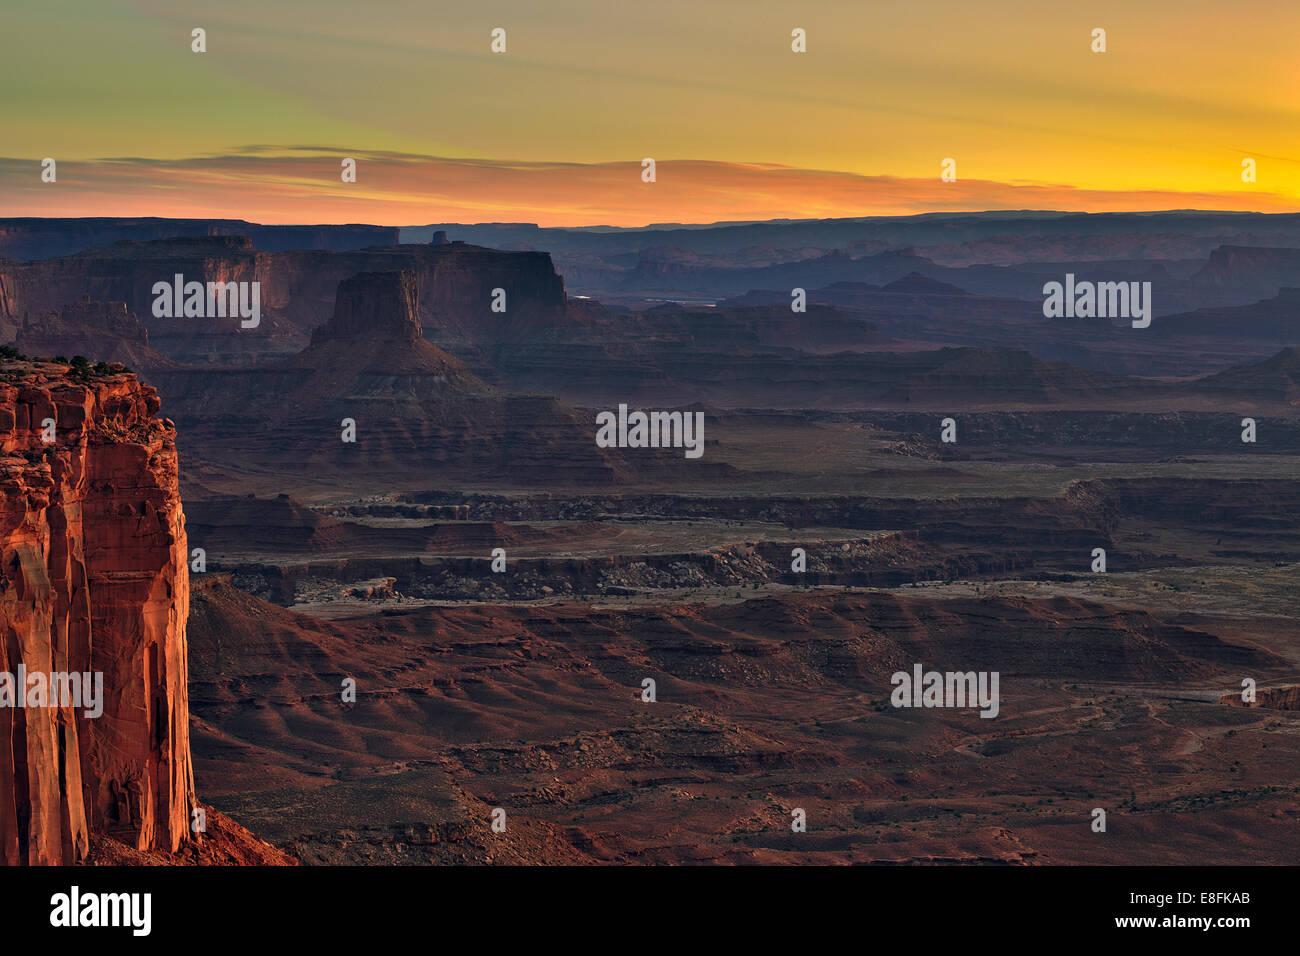 USA, Utah, San Juan, Grand View Point Road, Canyonlands National Park, Blick auf den canyon Stockbild